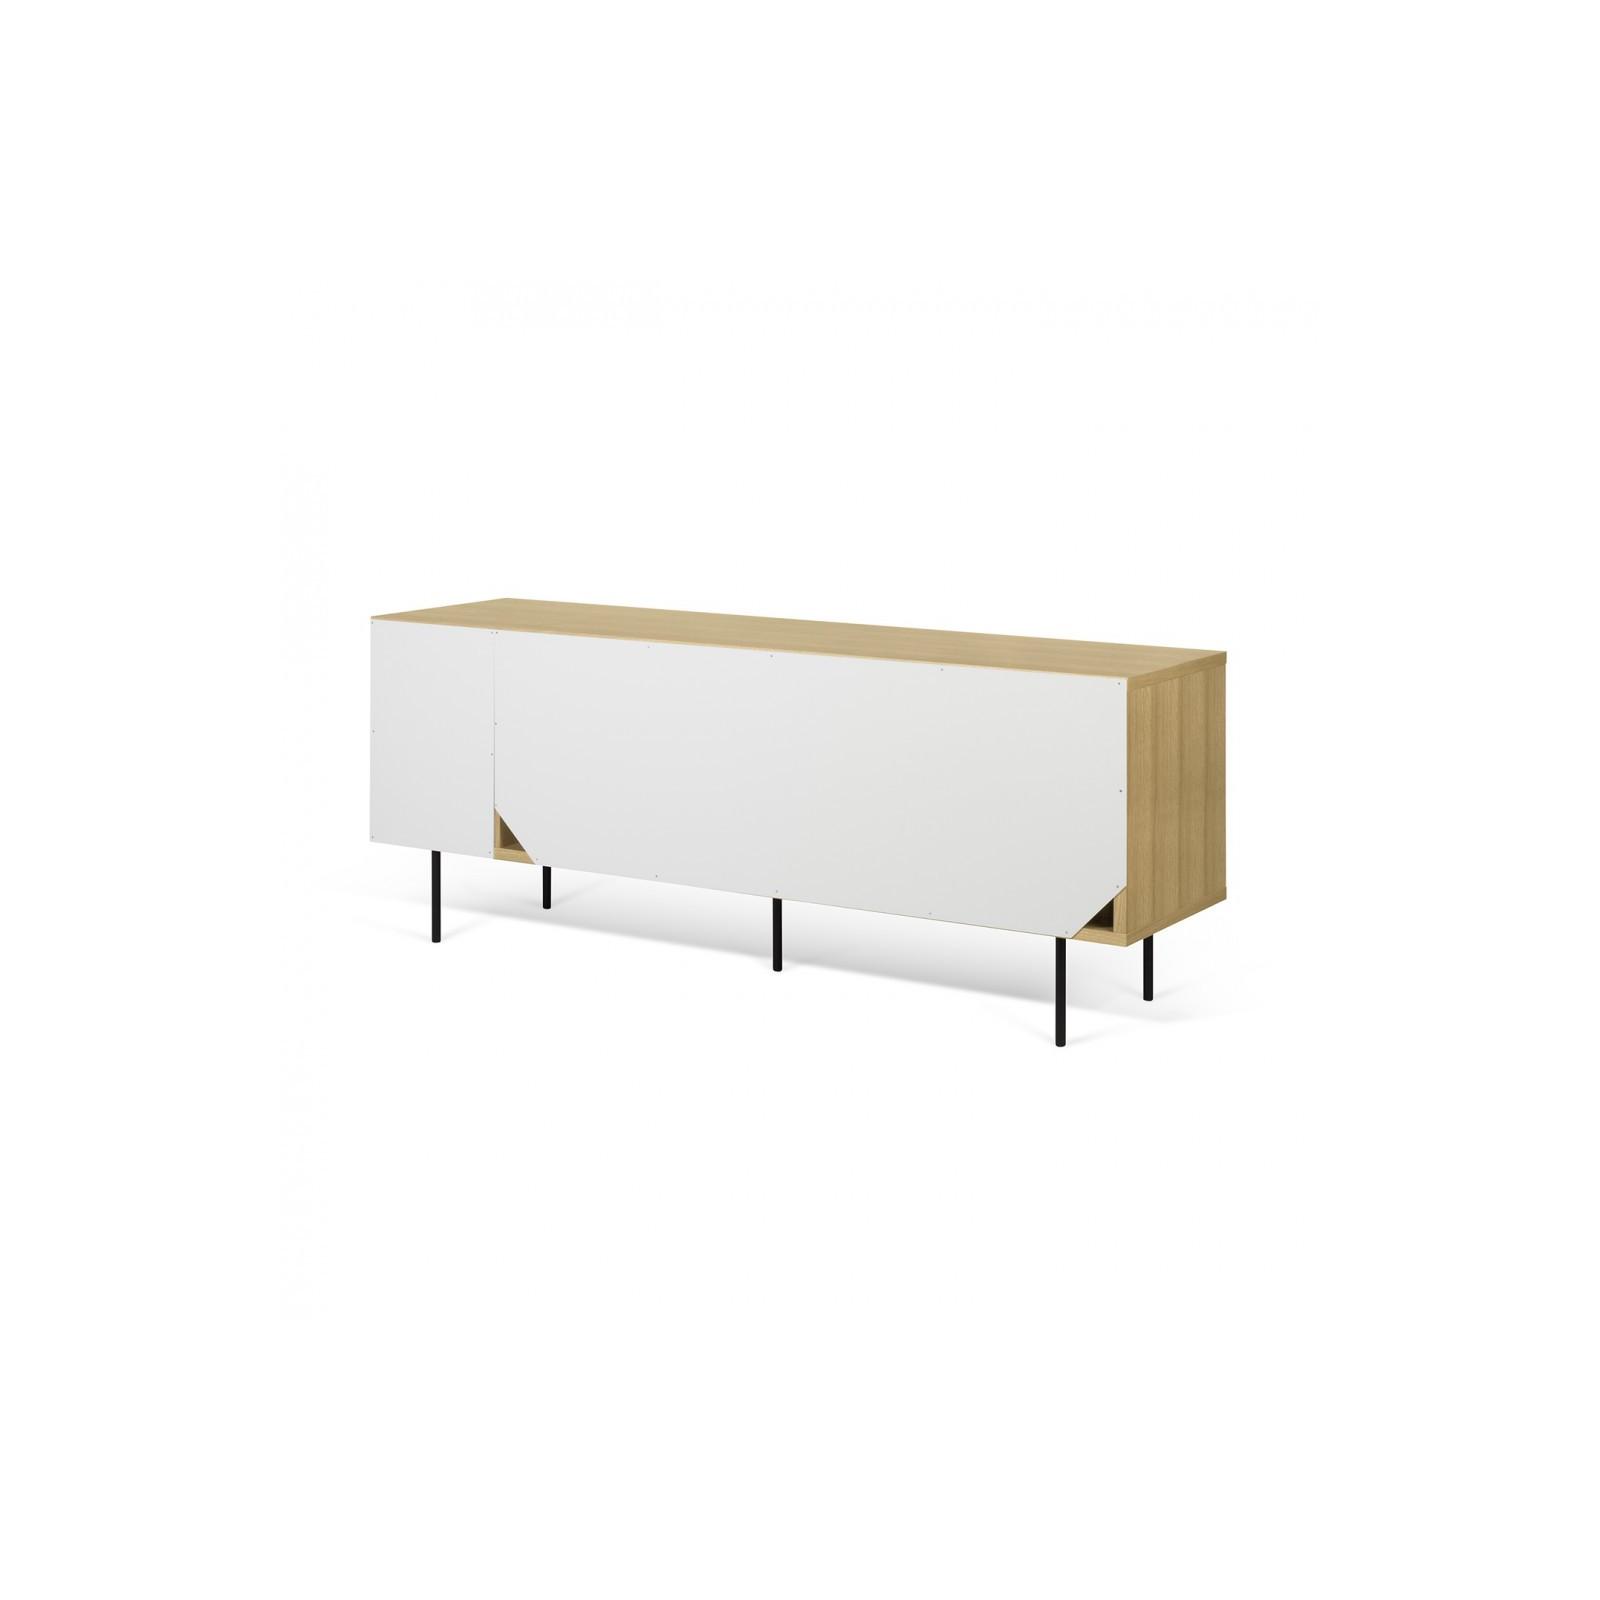 buffet danois blanc et bois arne concept. Black Bedroom Furniture Sets. Home Design Ideas